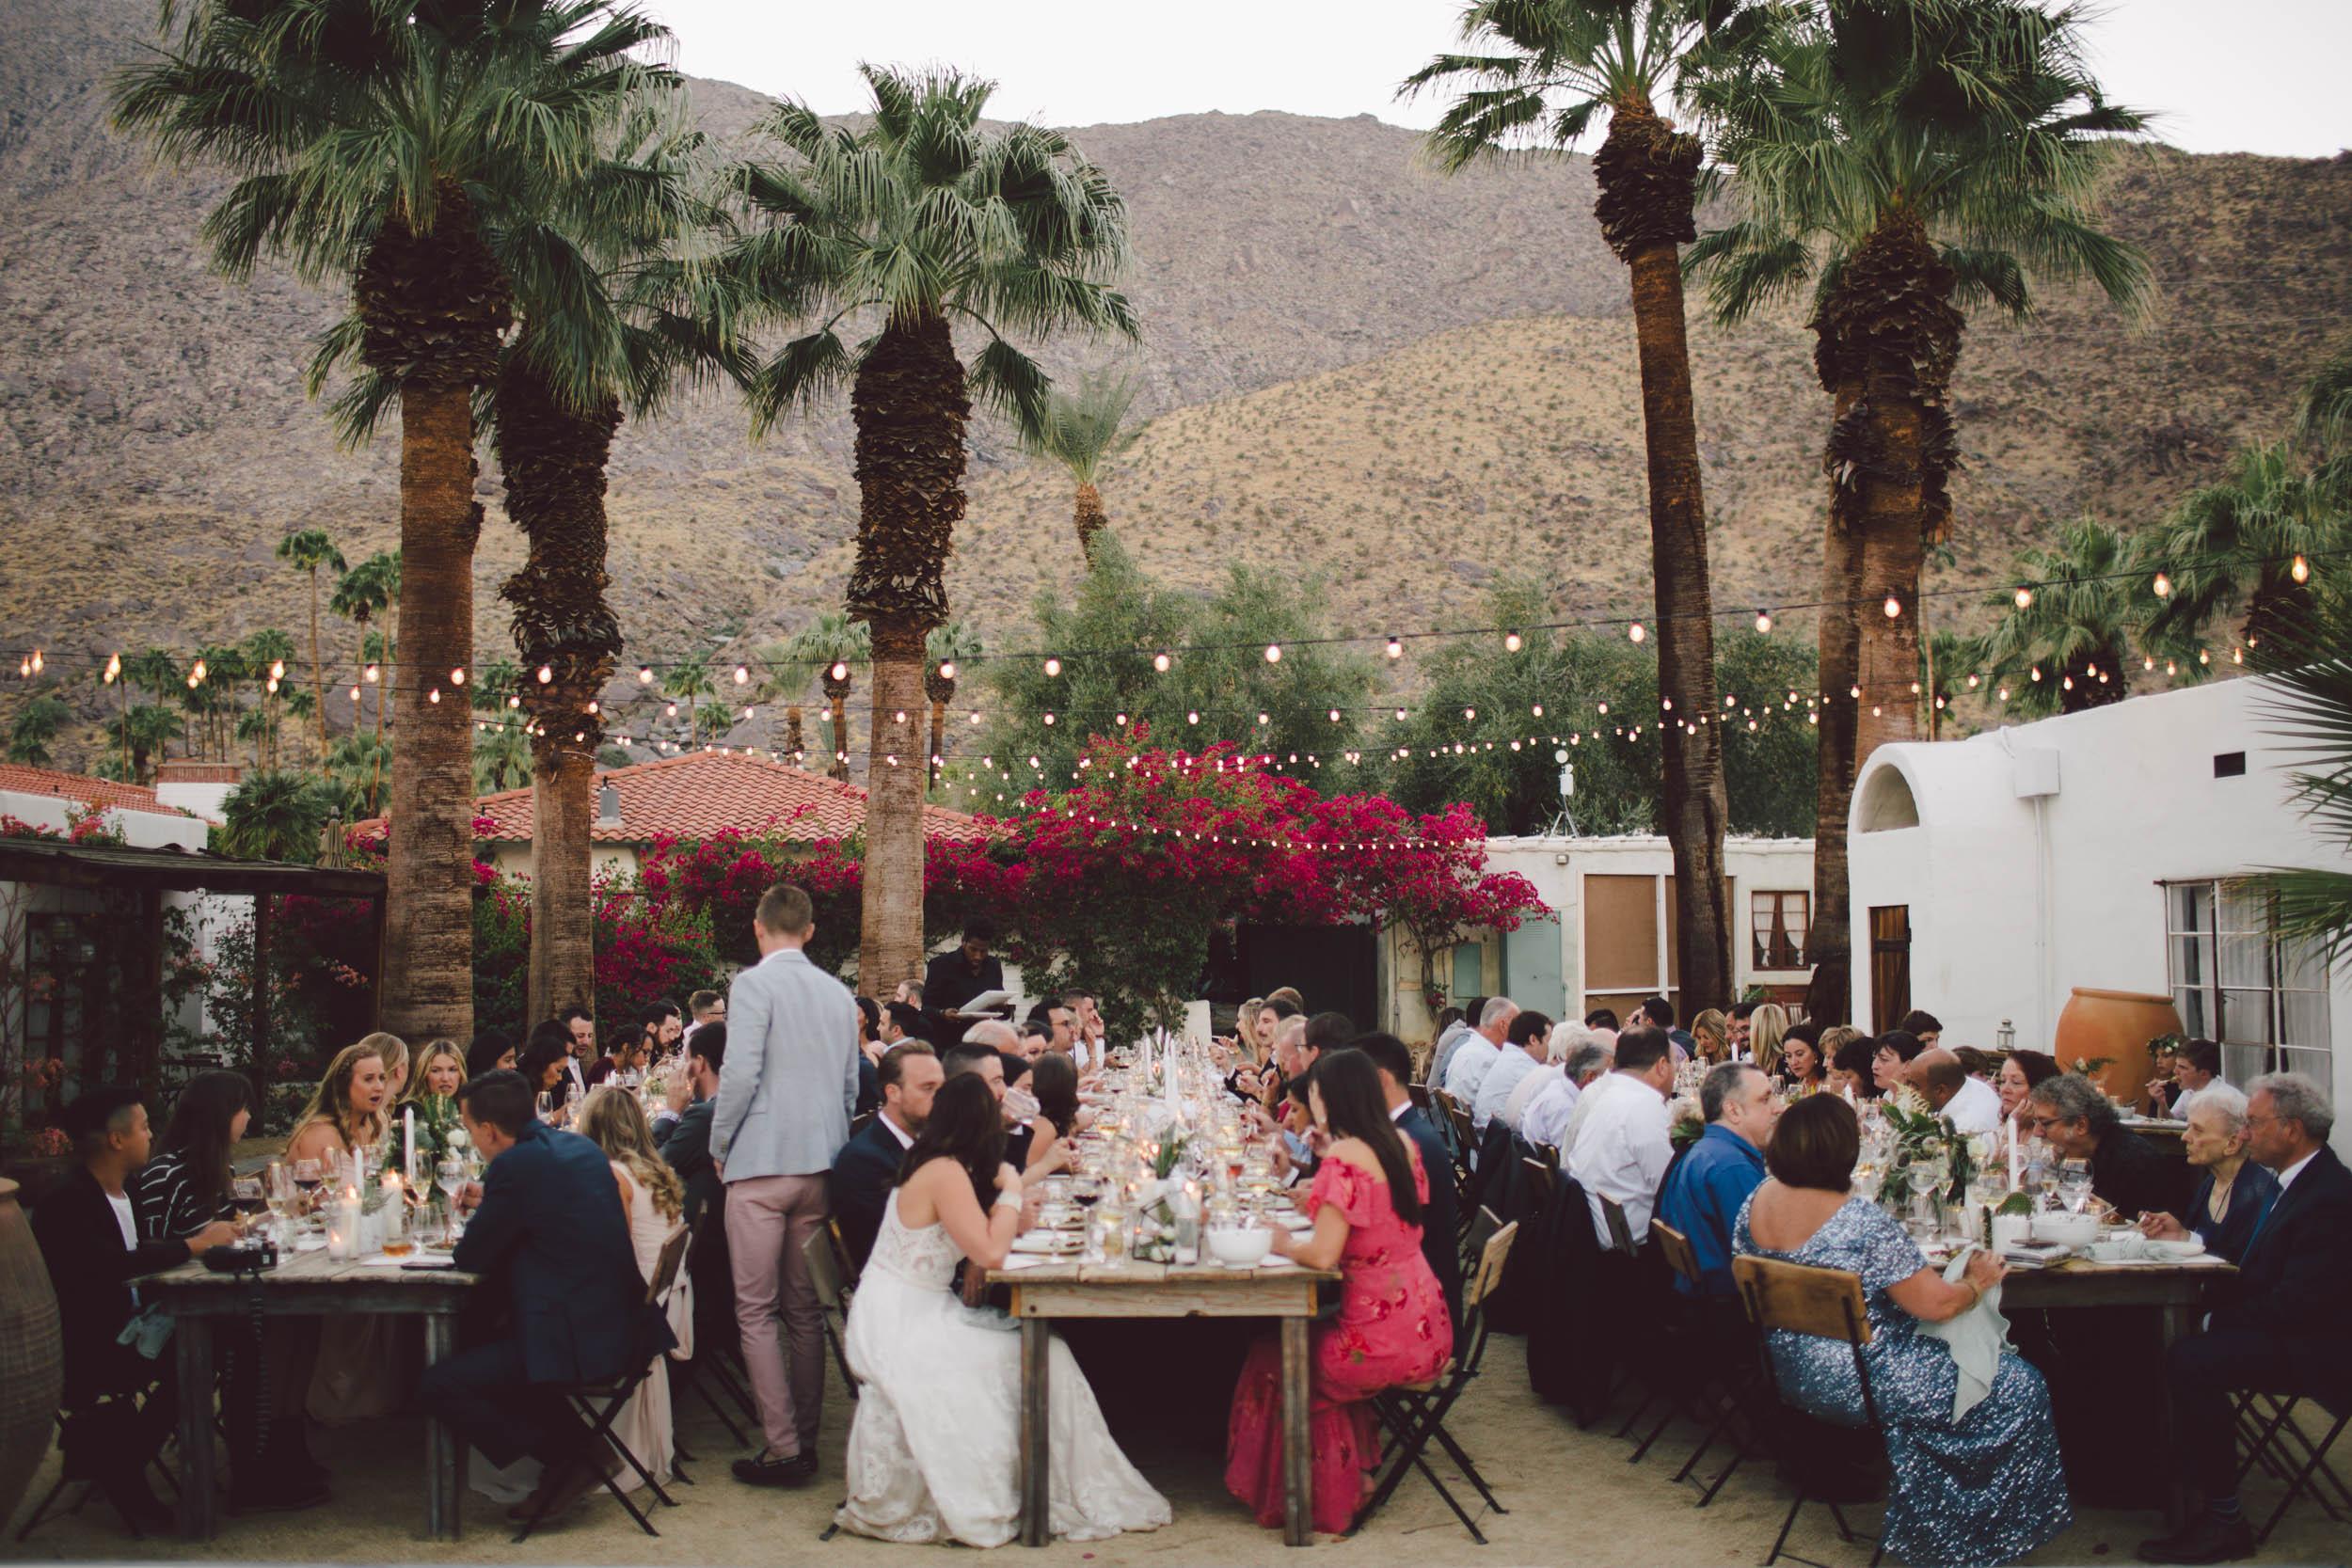 Annie + Ken - Korakia pensione palm springs, california intimate wedding